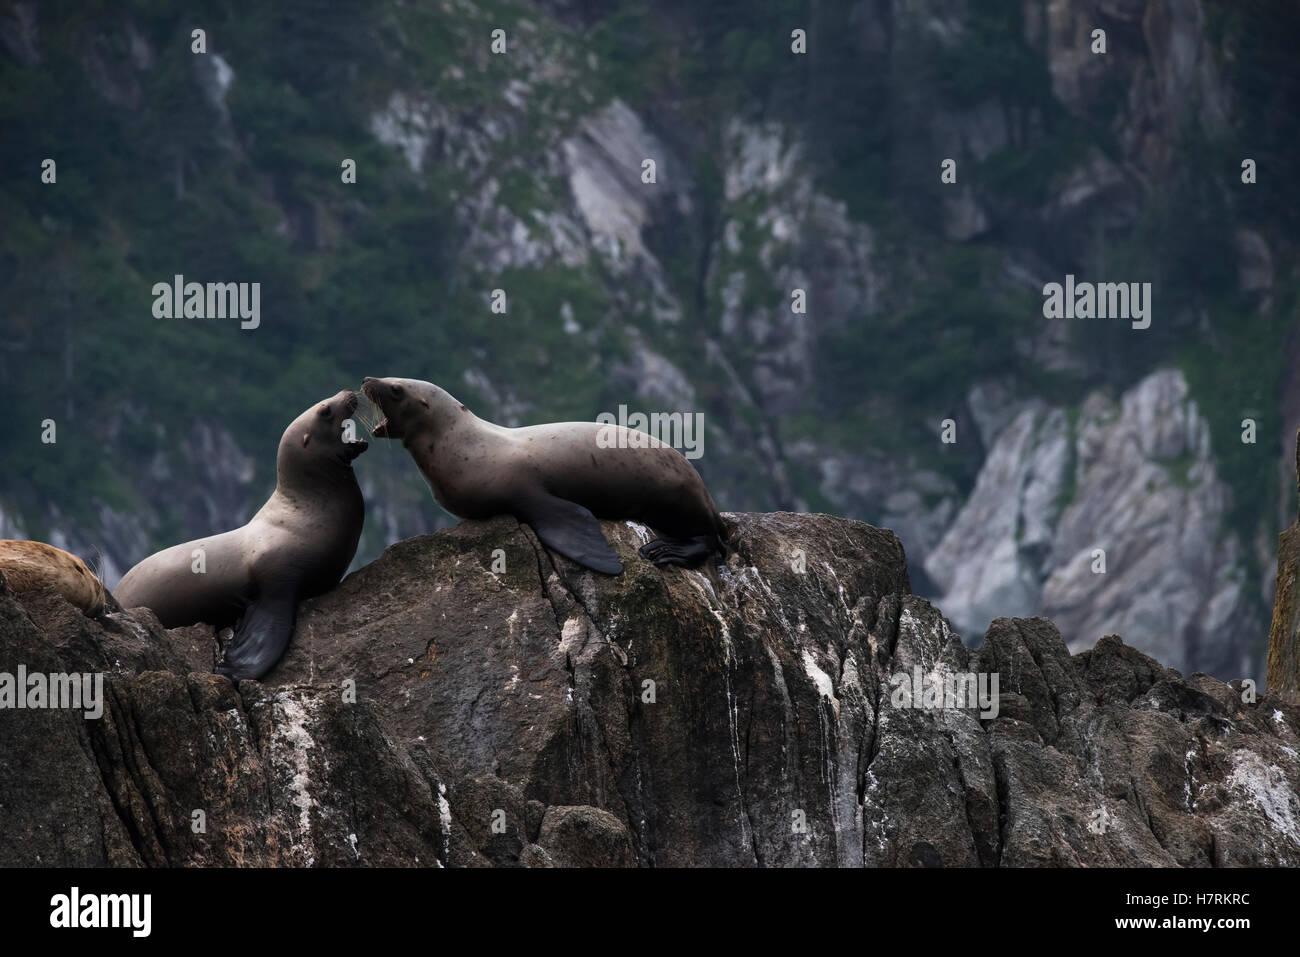 Stellar sea lions (Eumetopias jubatus) on the rocks in the harbour; Seward, Alaska, United States of America - Stock Image